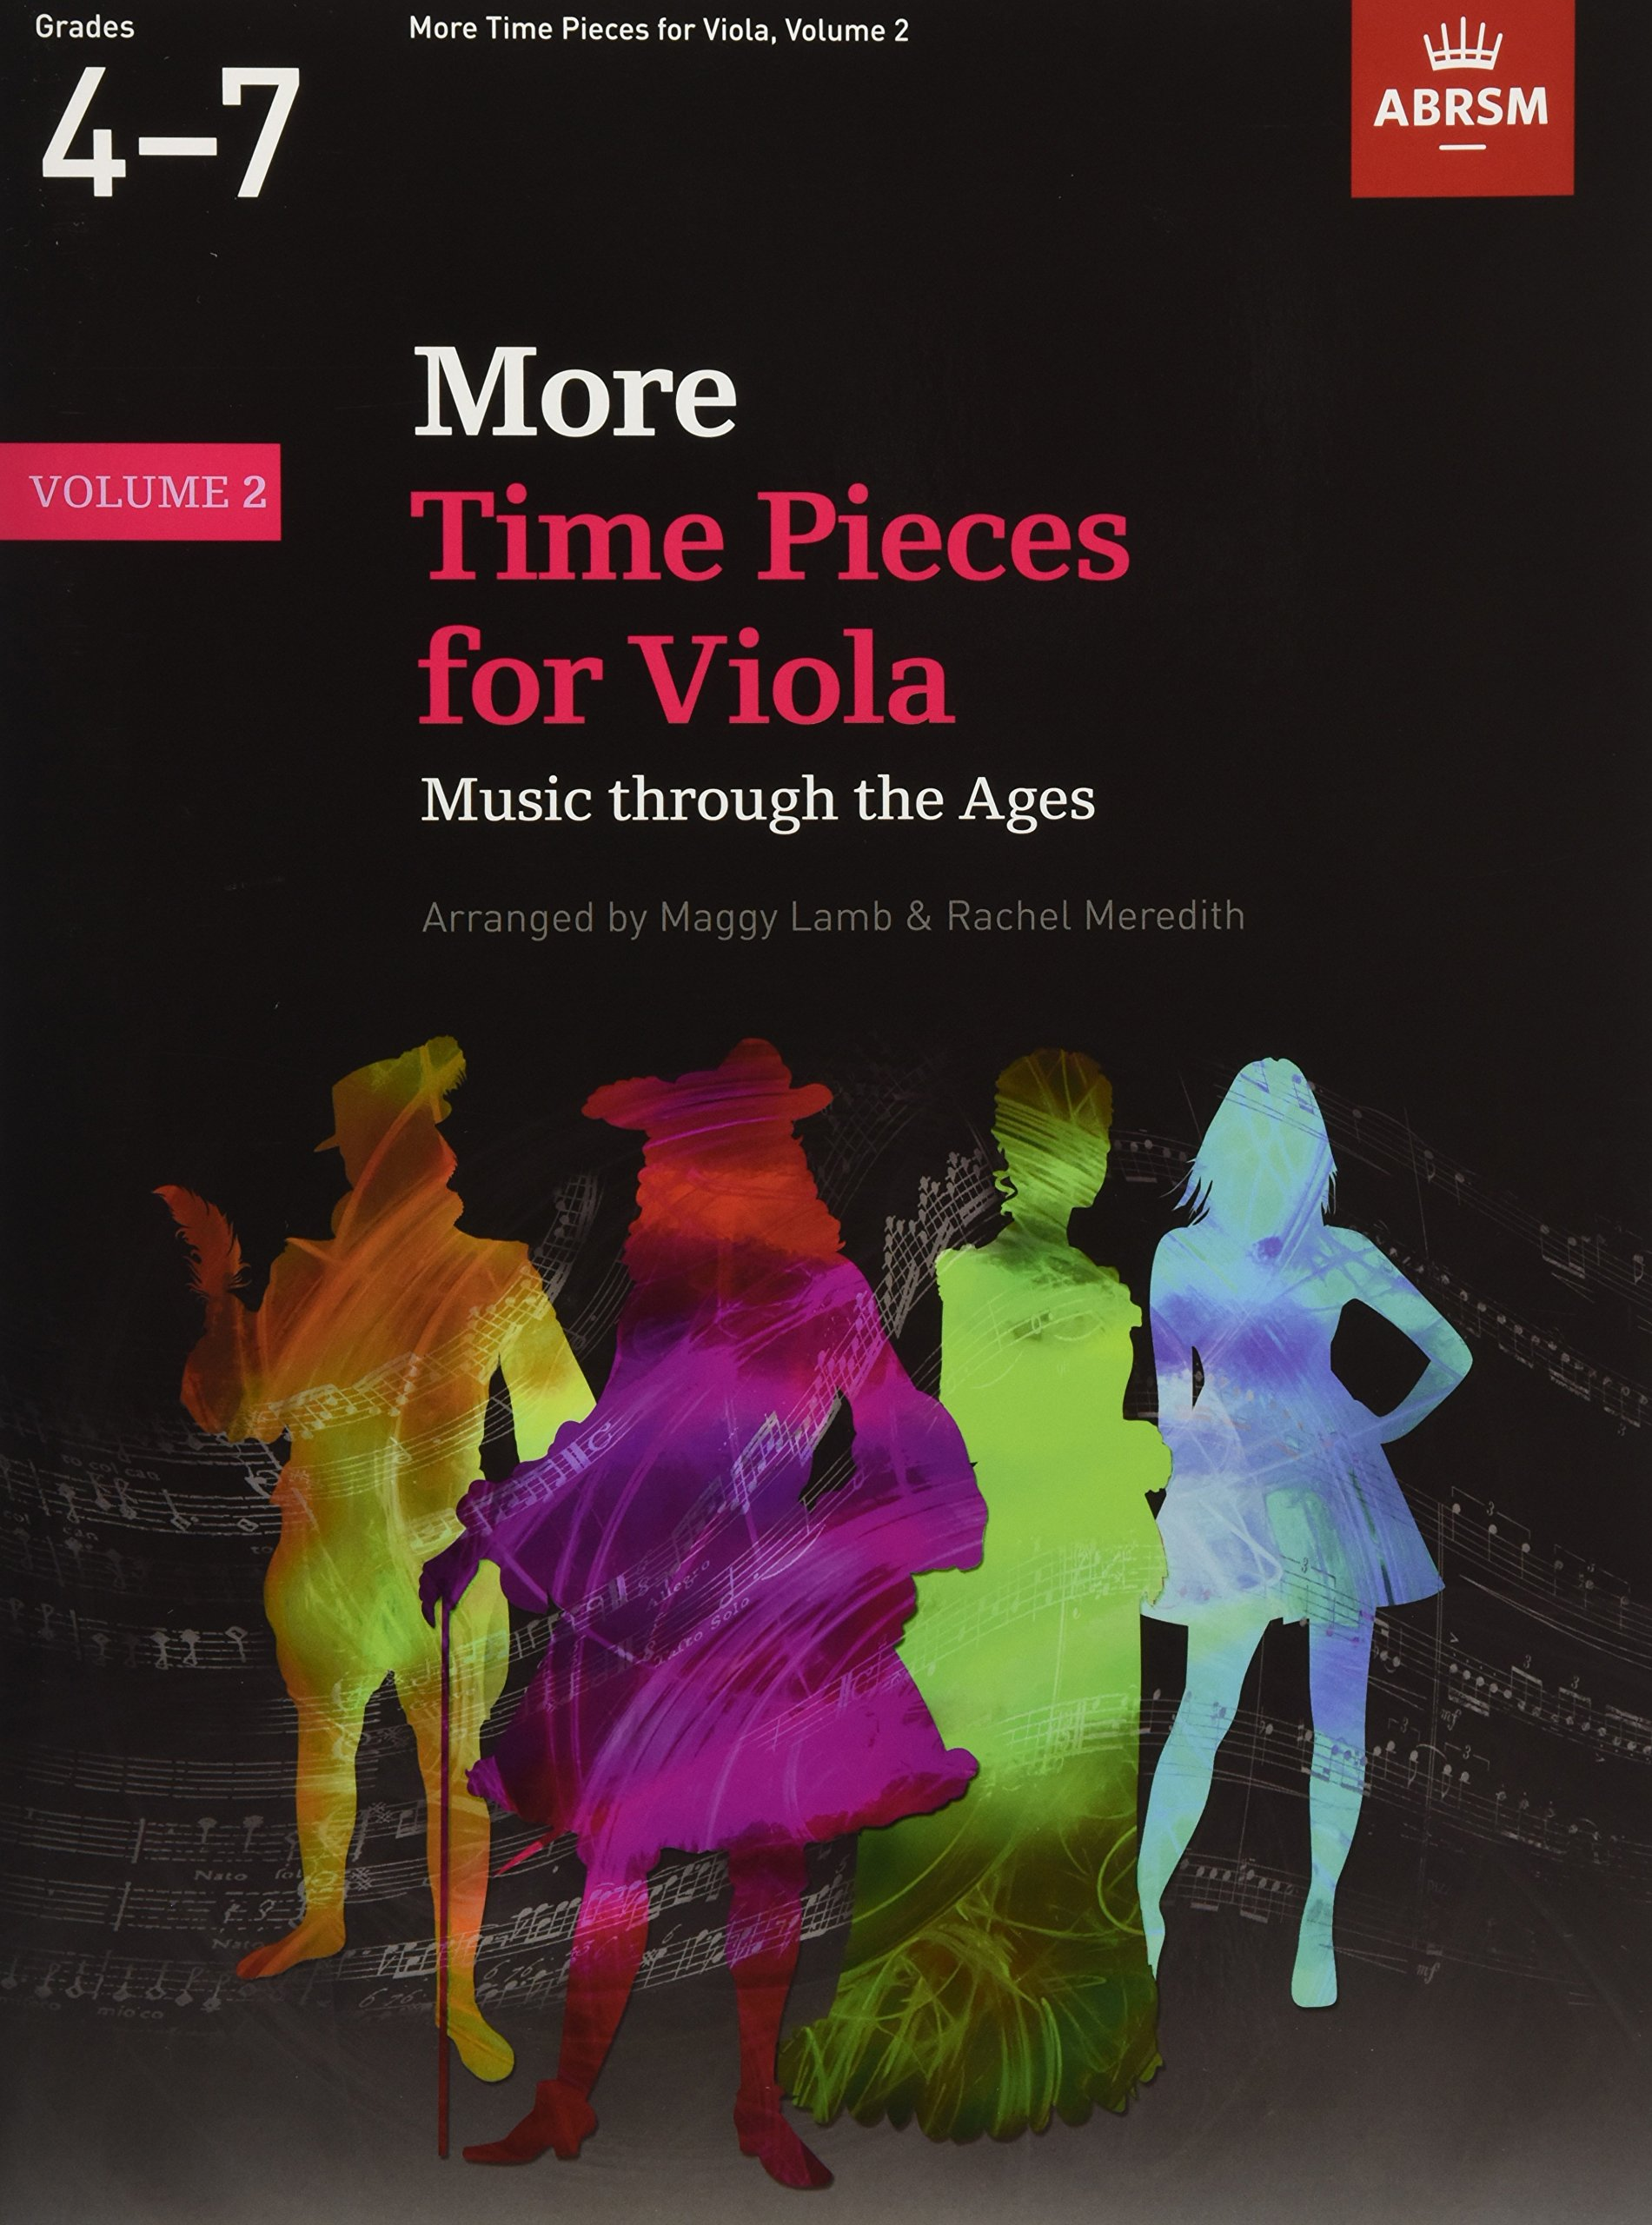 More Time Pieces for Viola, Volume 2: Music through the Ages (Time Pieces (ABRSM)) Sheet music – 2 Jul 2015 Divers Auteurs OUP Oxford 1848497458 Music & Dance